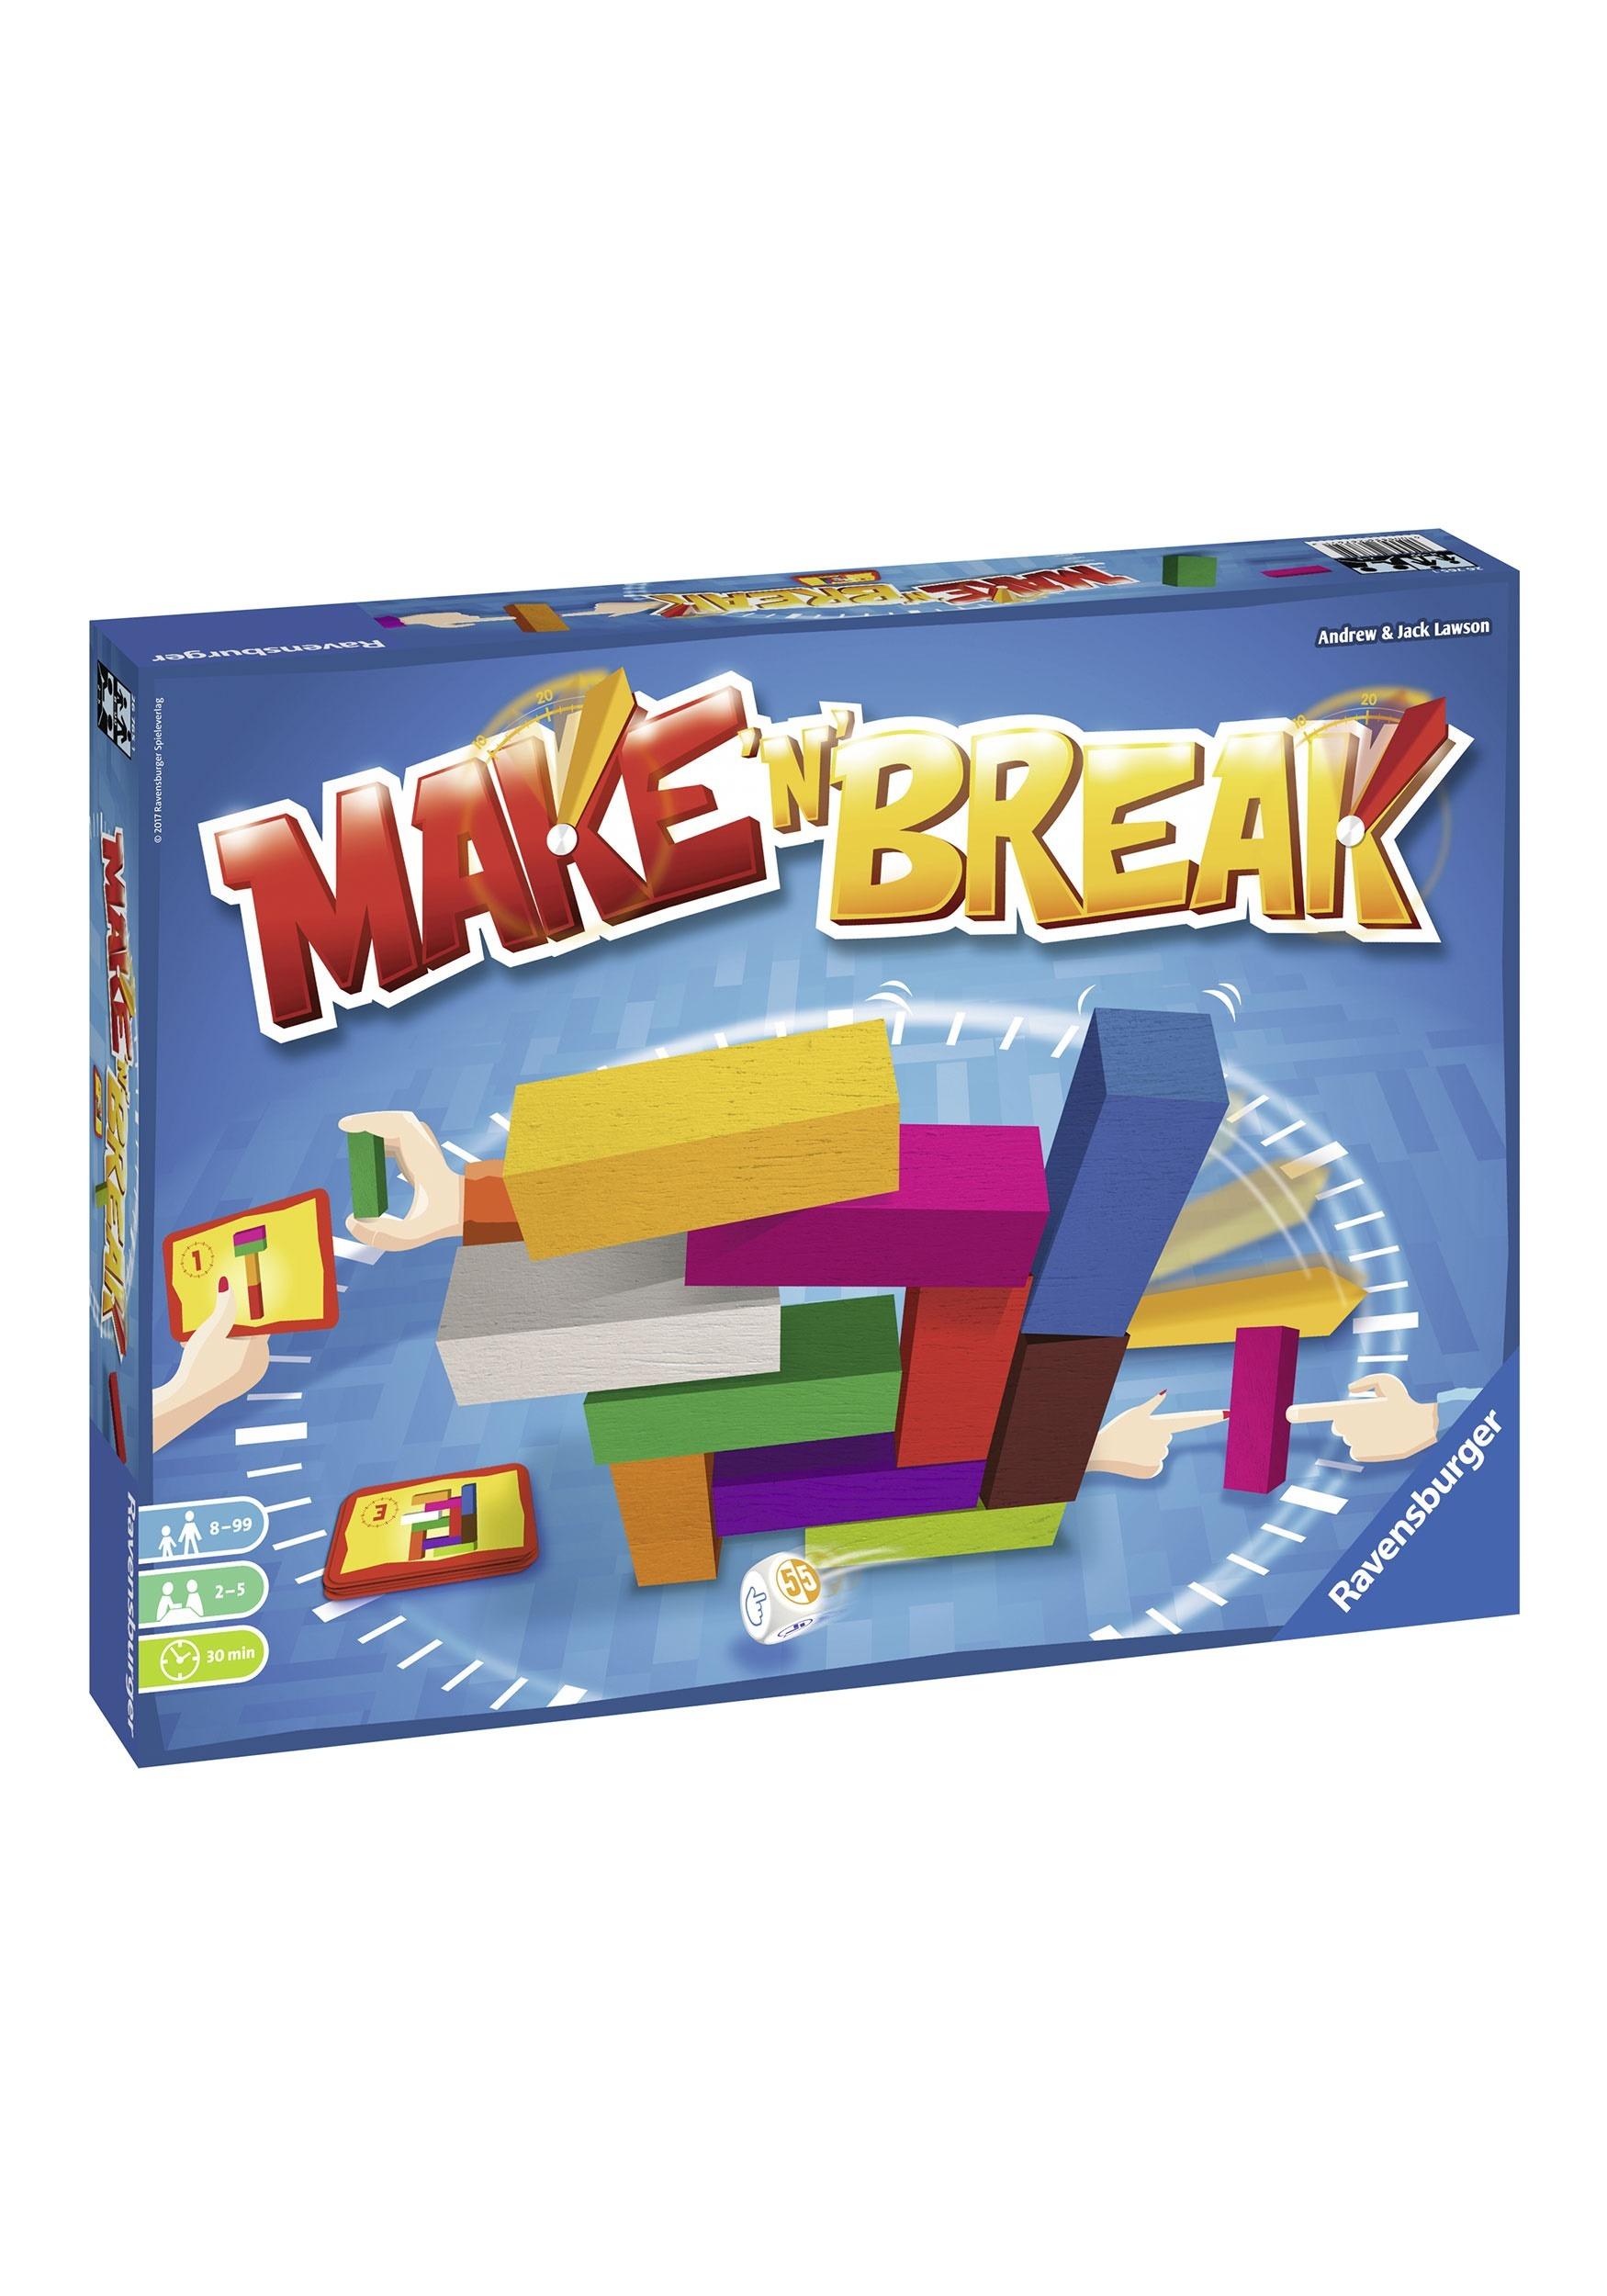 Make 'N' Break Famliy Game